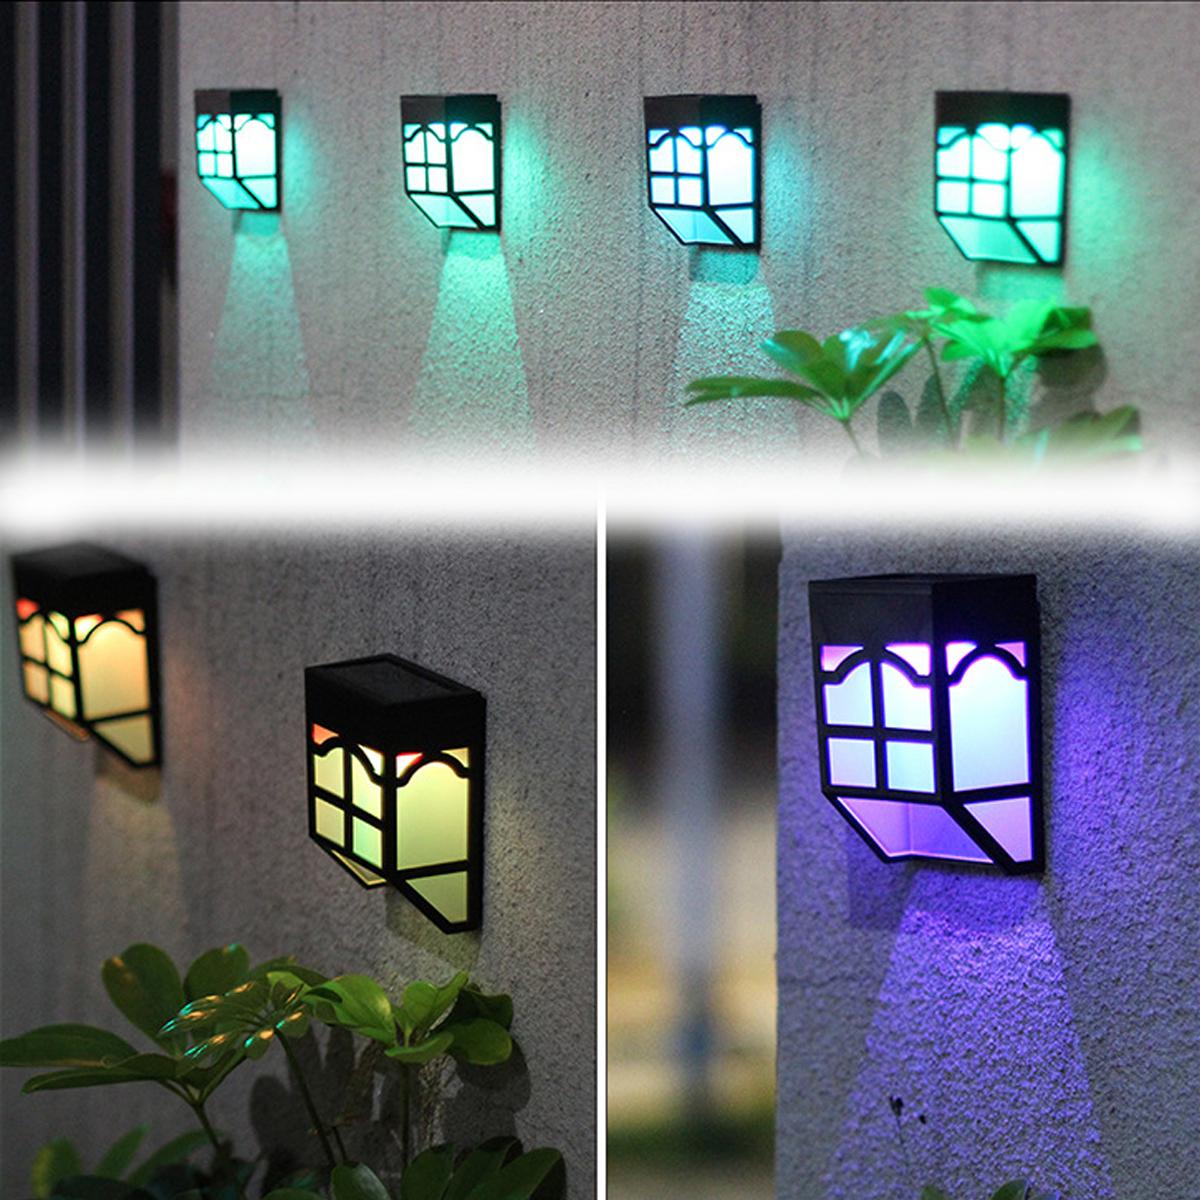 НаоткрытомвоздухеСолнечнаяСадСвет LED Путь стены Пейзаж Mount Light Забор Фонарь Street Лампа - фото 3